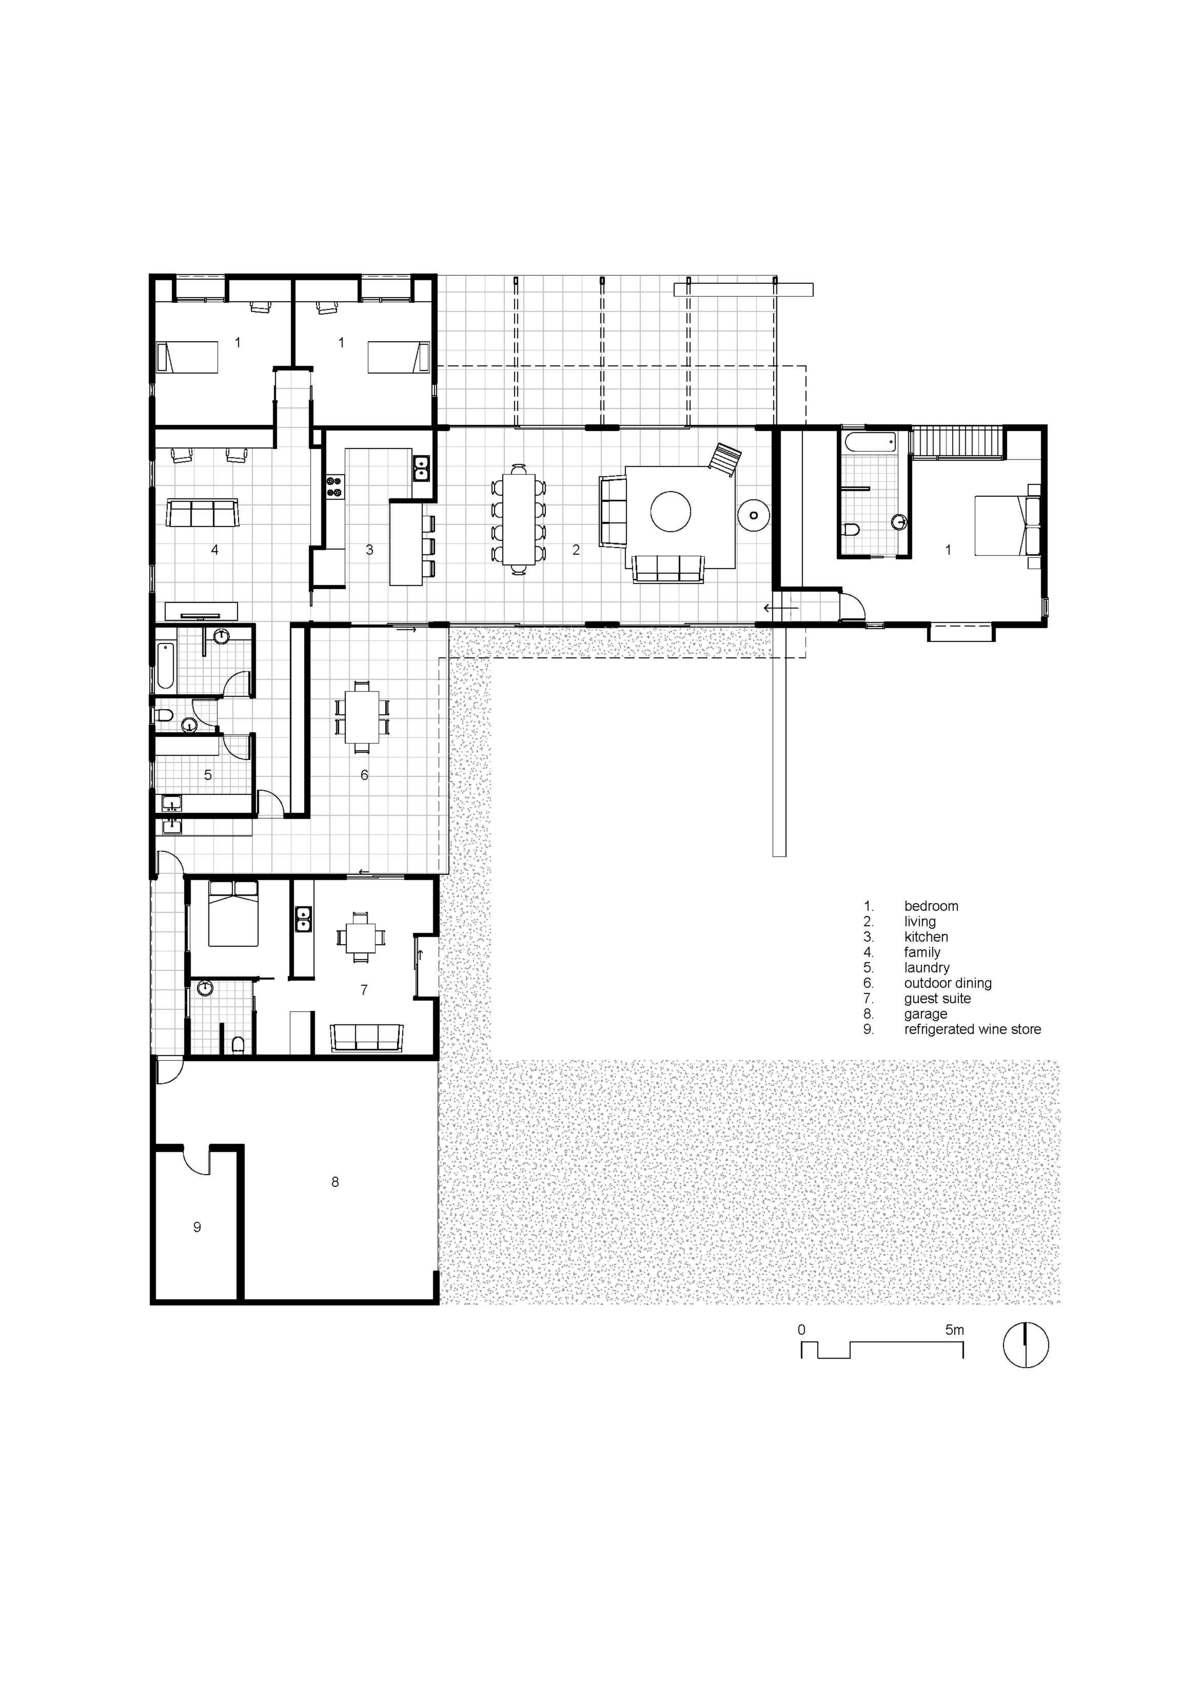 Wistow House